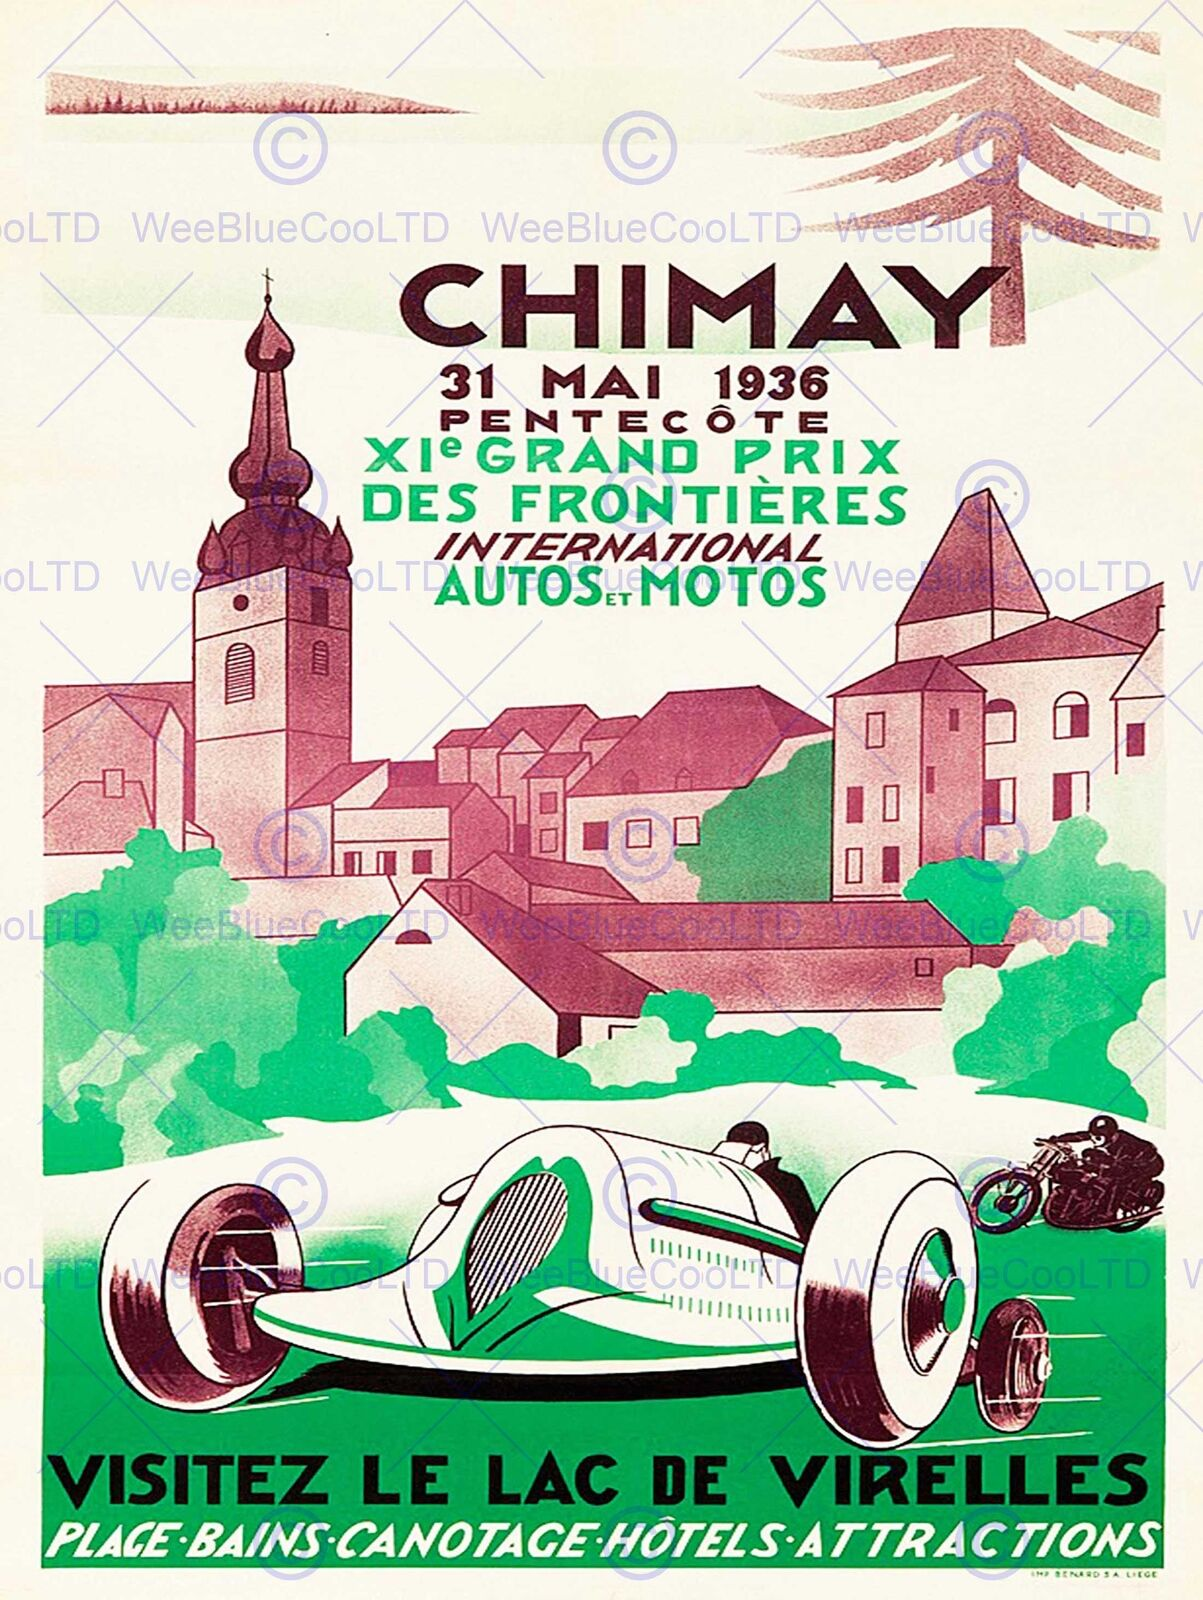 ADVERT EXHIBITION MOTOR SPORT CHIMAY BREWERY BELGIUM HOTEL SPA POSTERBB7883B